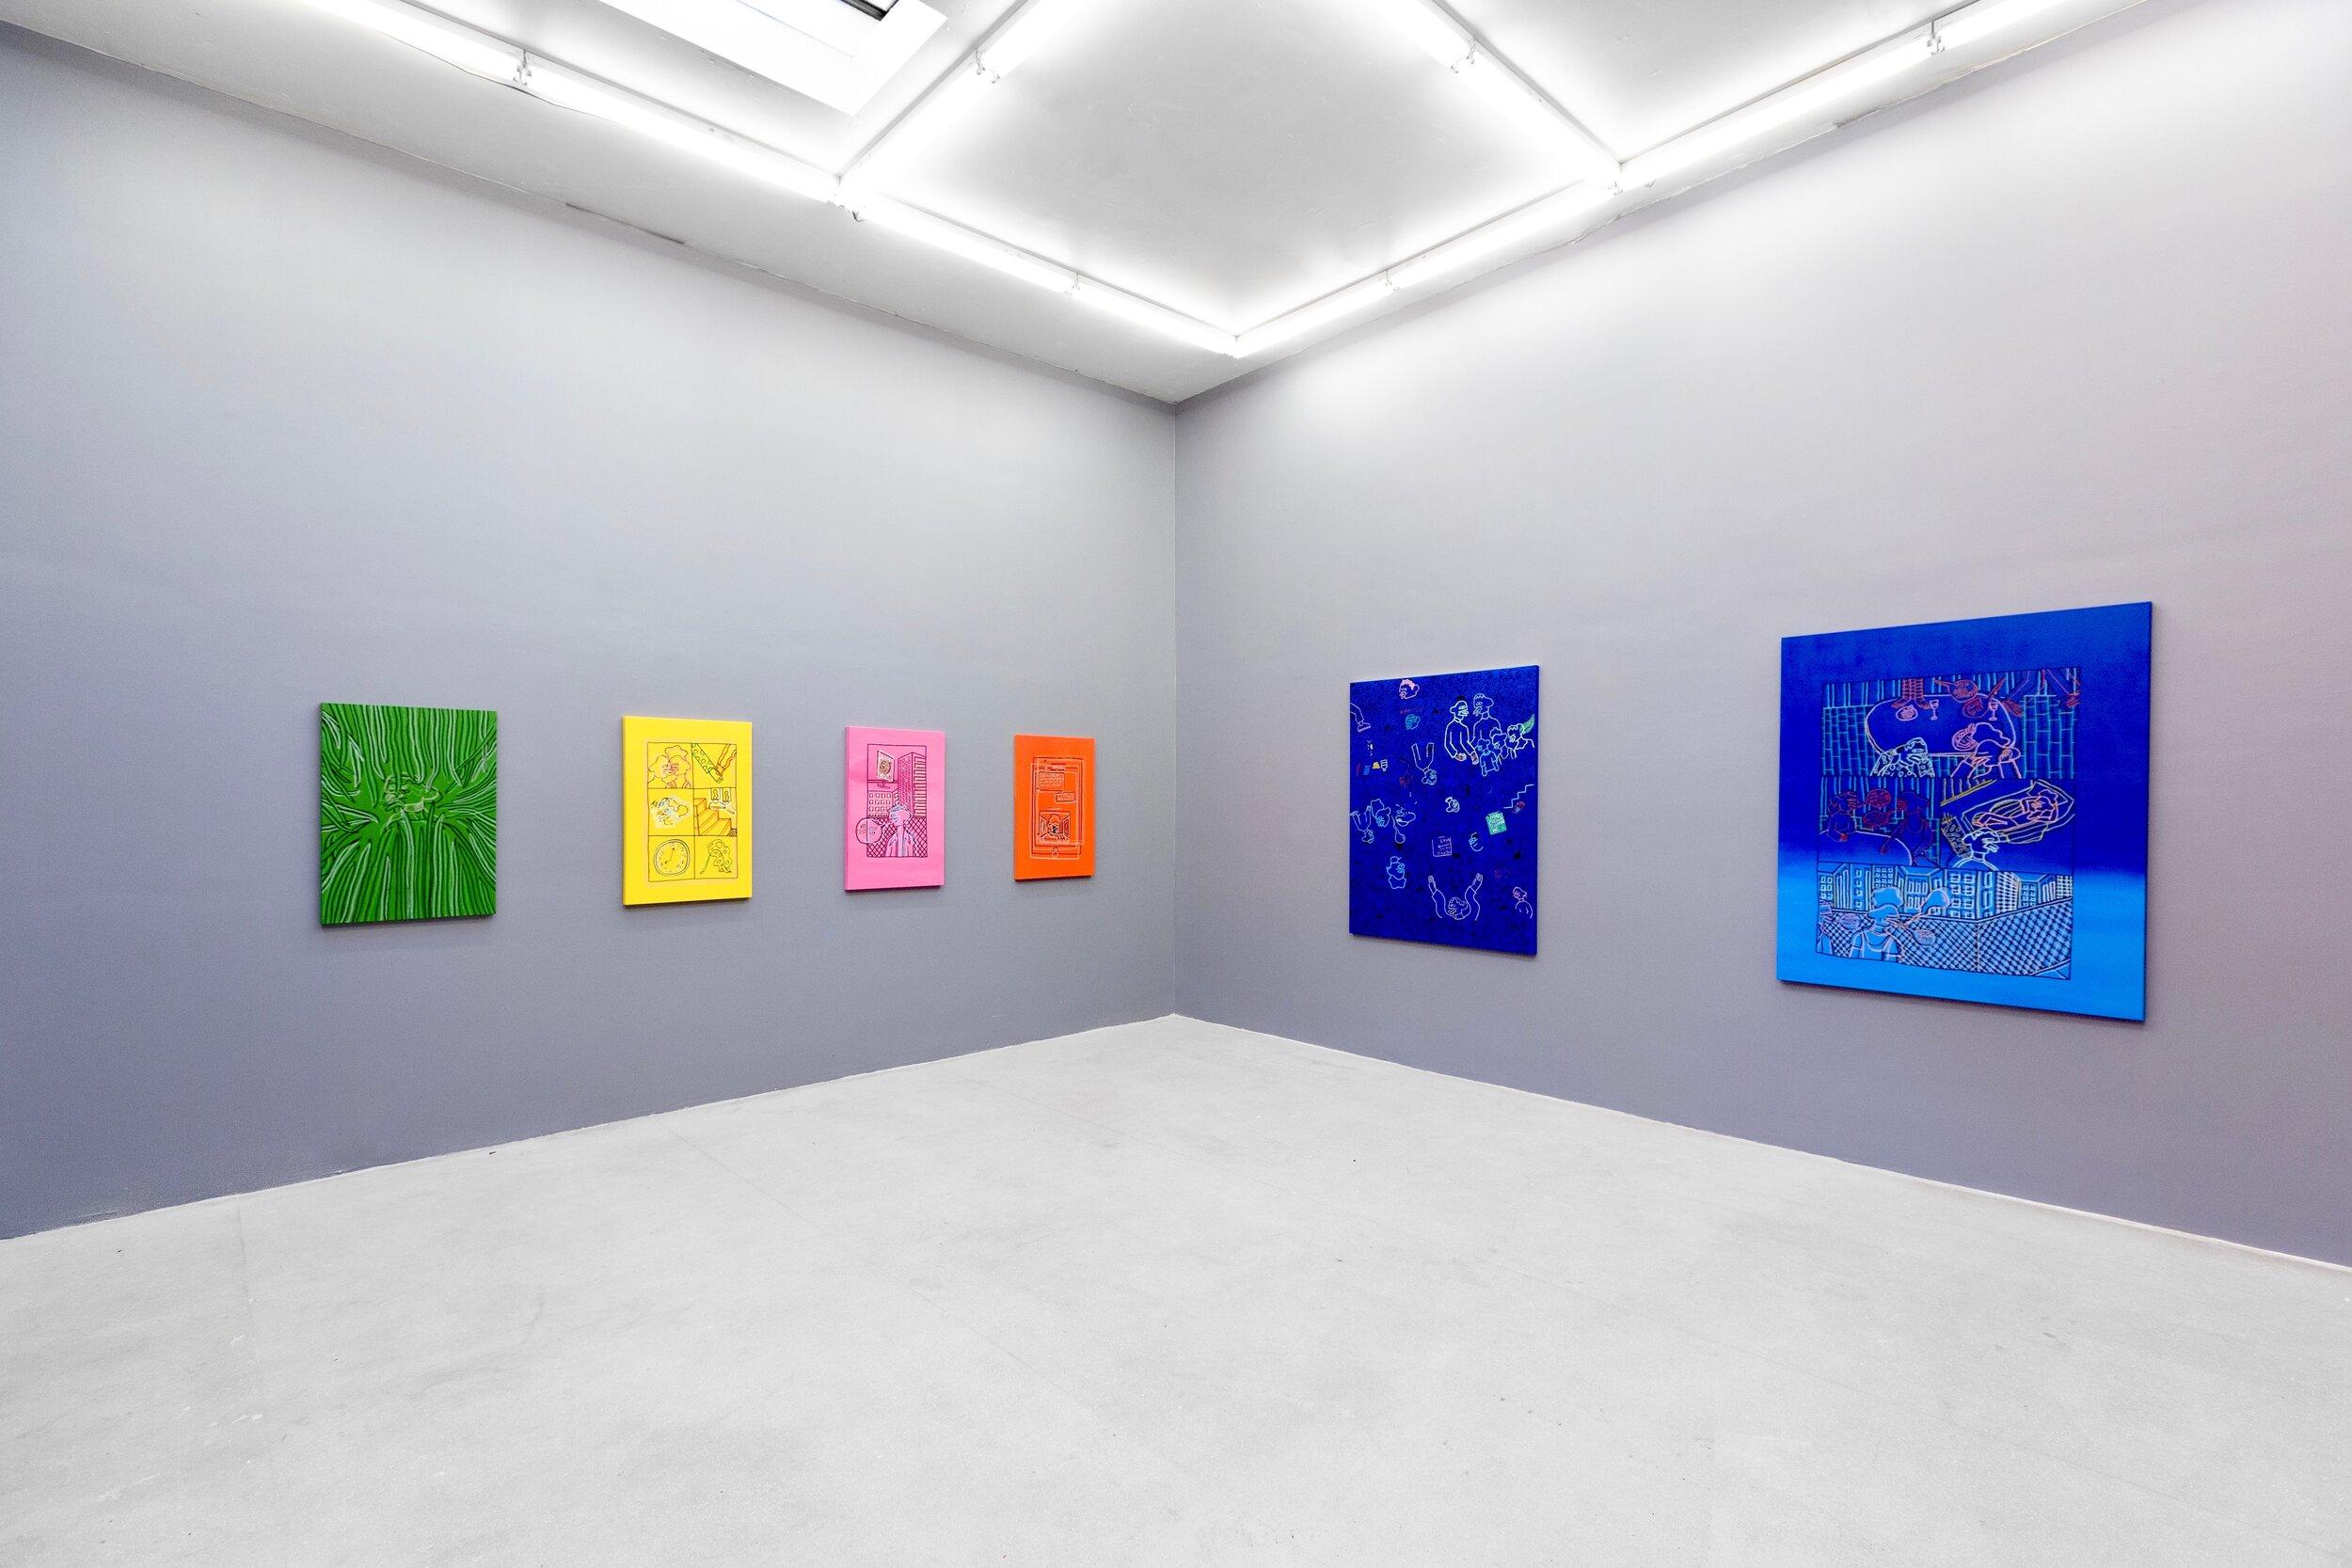 Installation view,  Conversation Derelict , Solo Exhibition by Corey Wash (image courtesy of Erik Bardin photography)